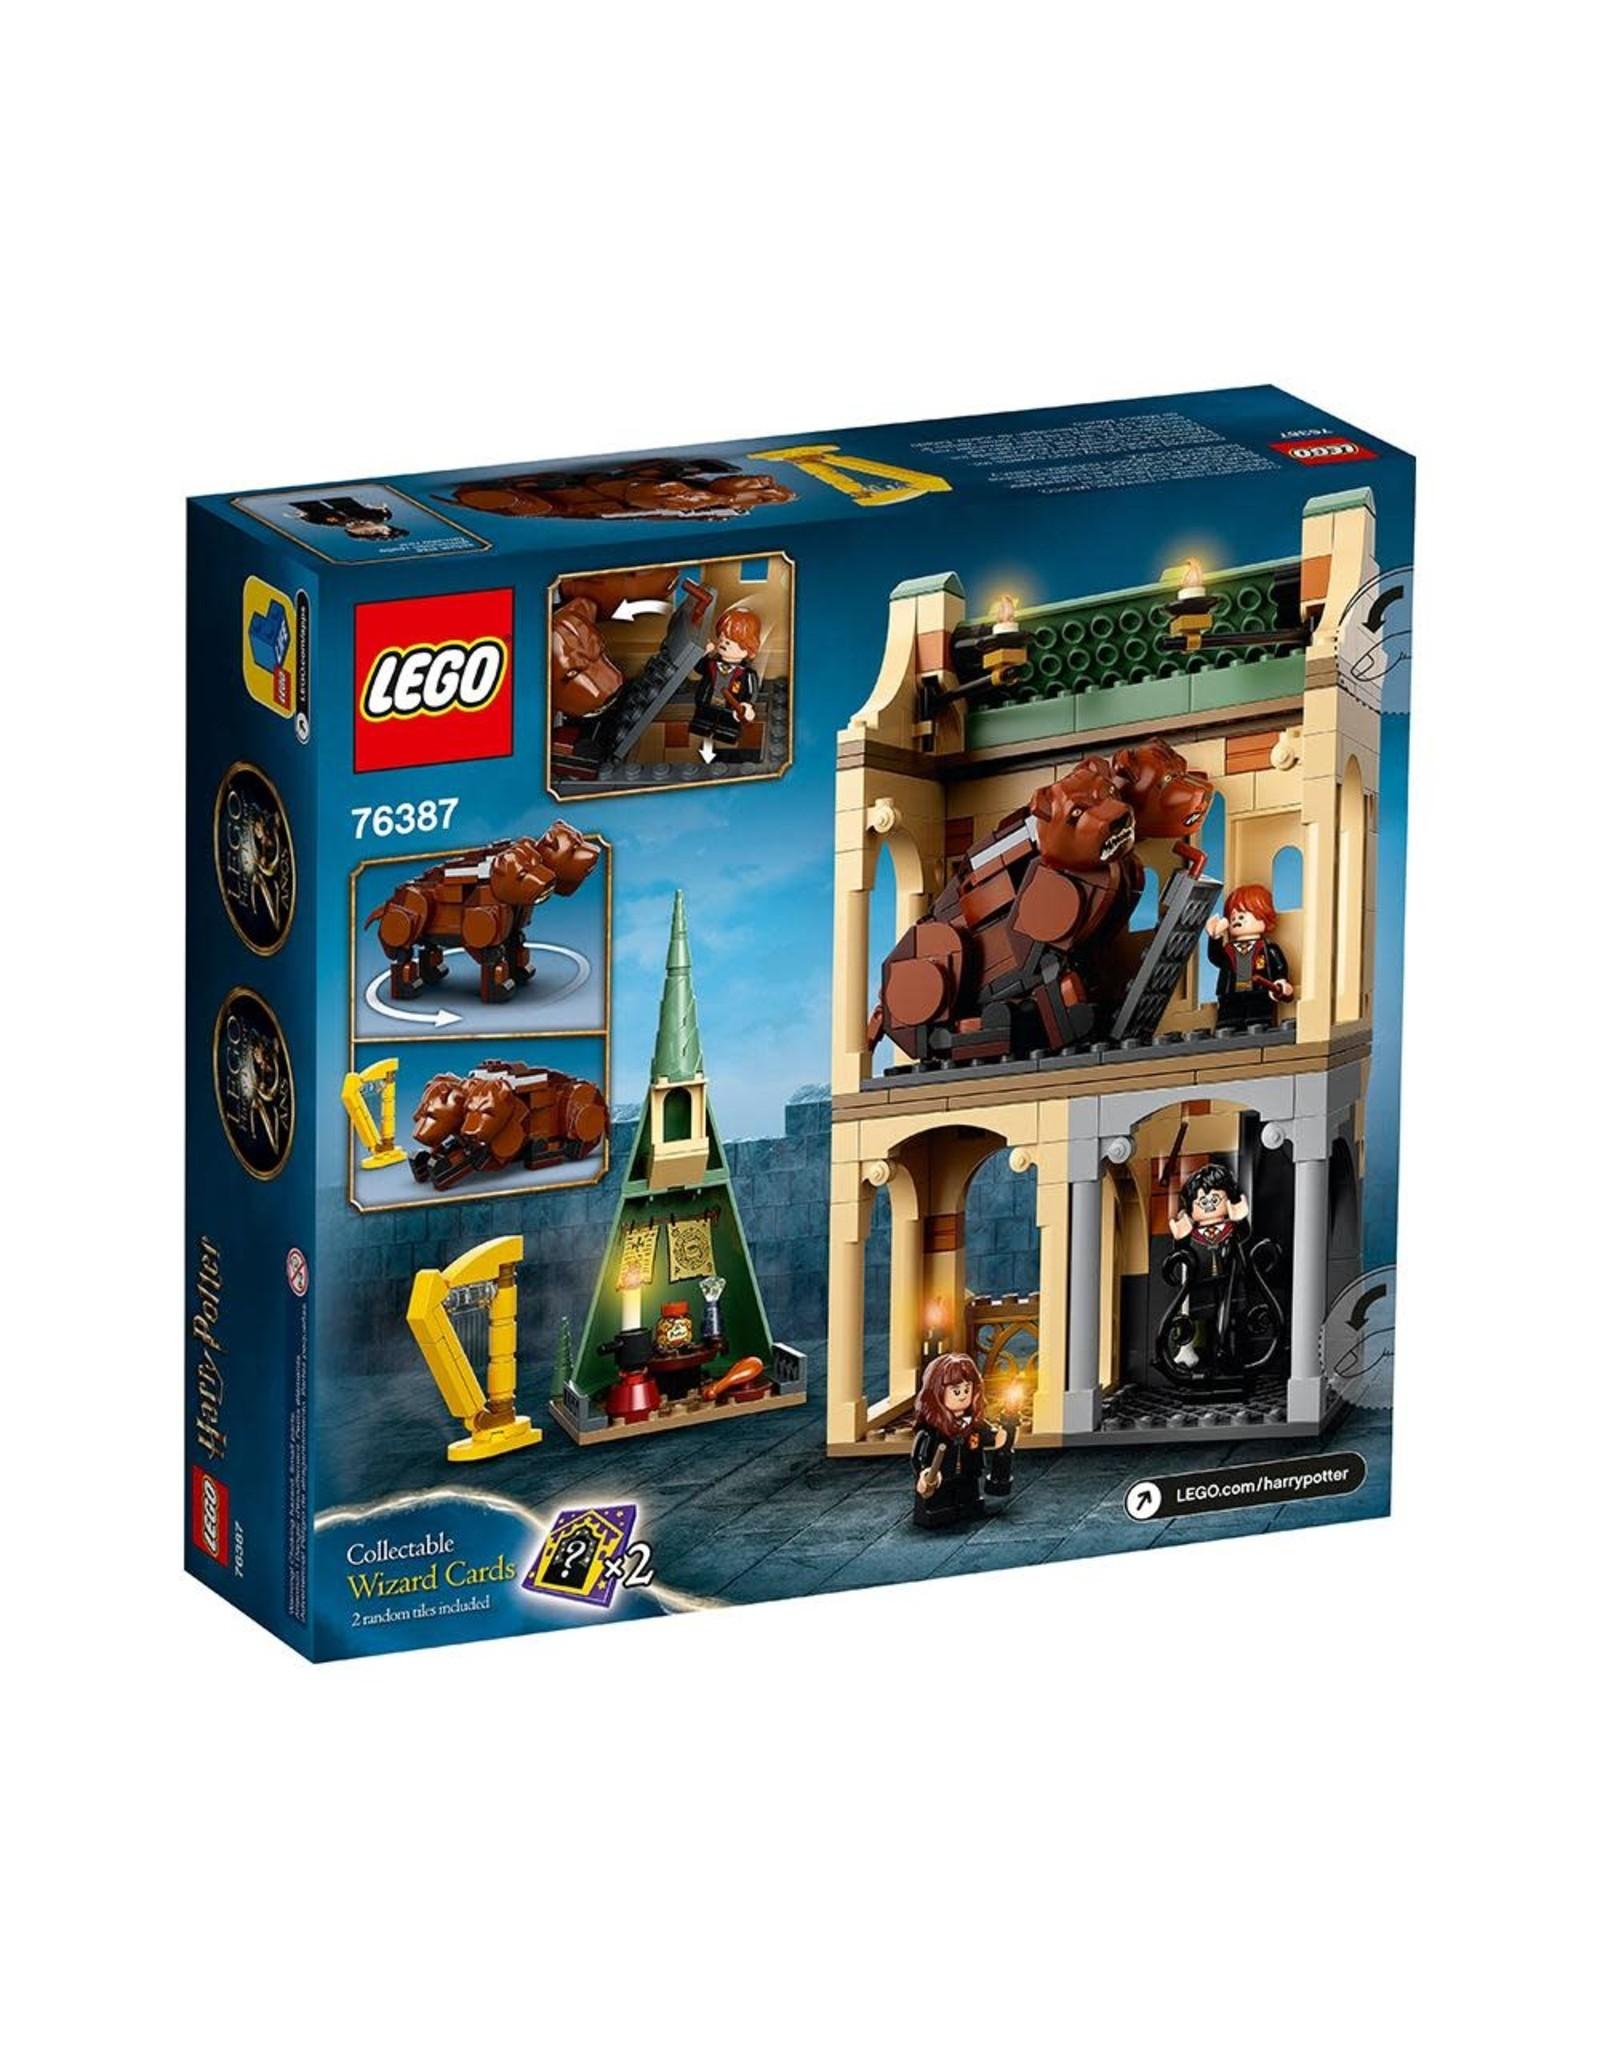 LEGO Harry Potter - 76387 Hogwarts: Fluffy Encounter